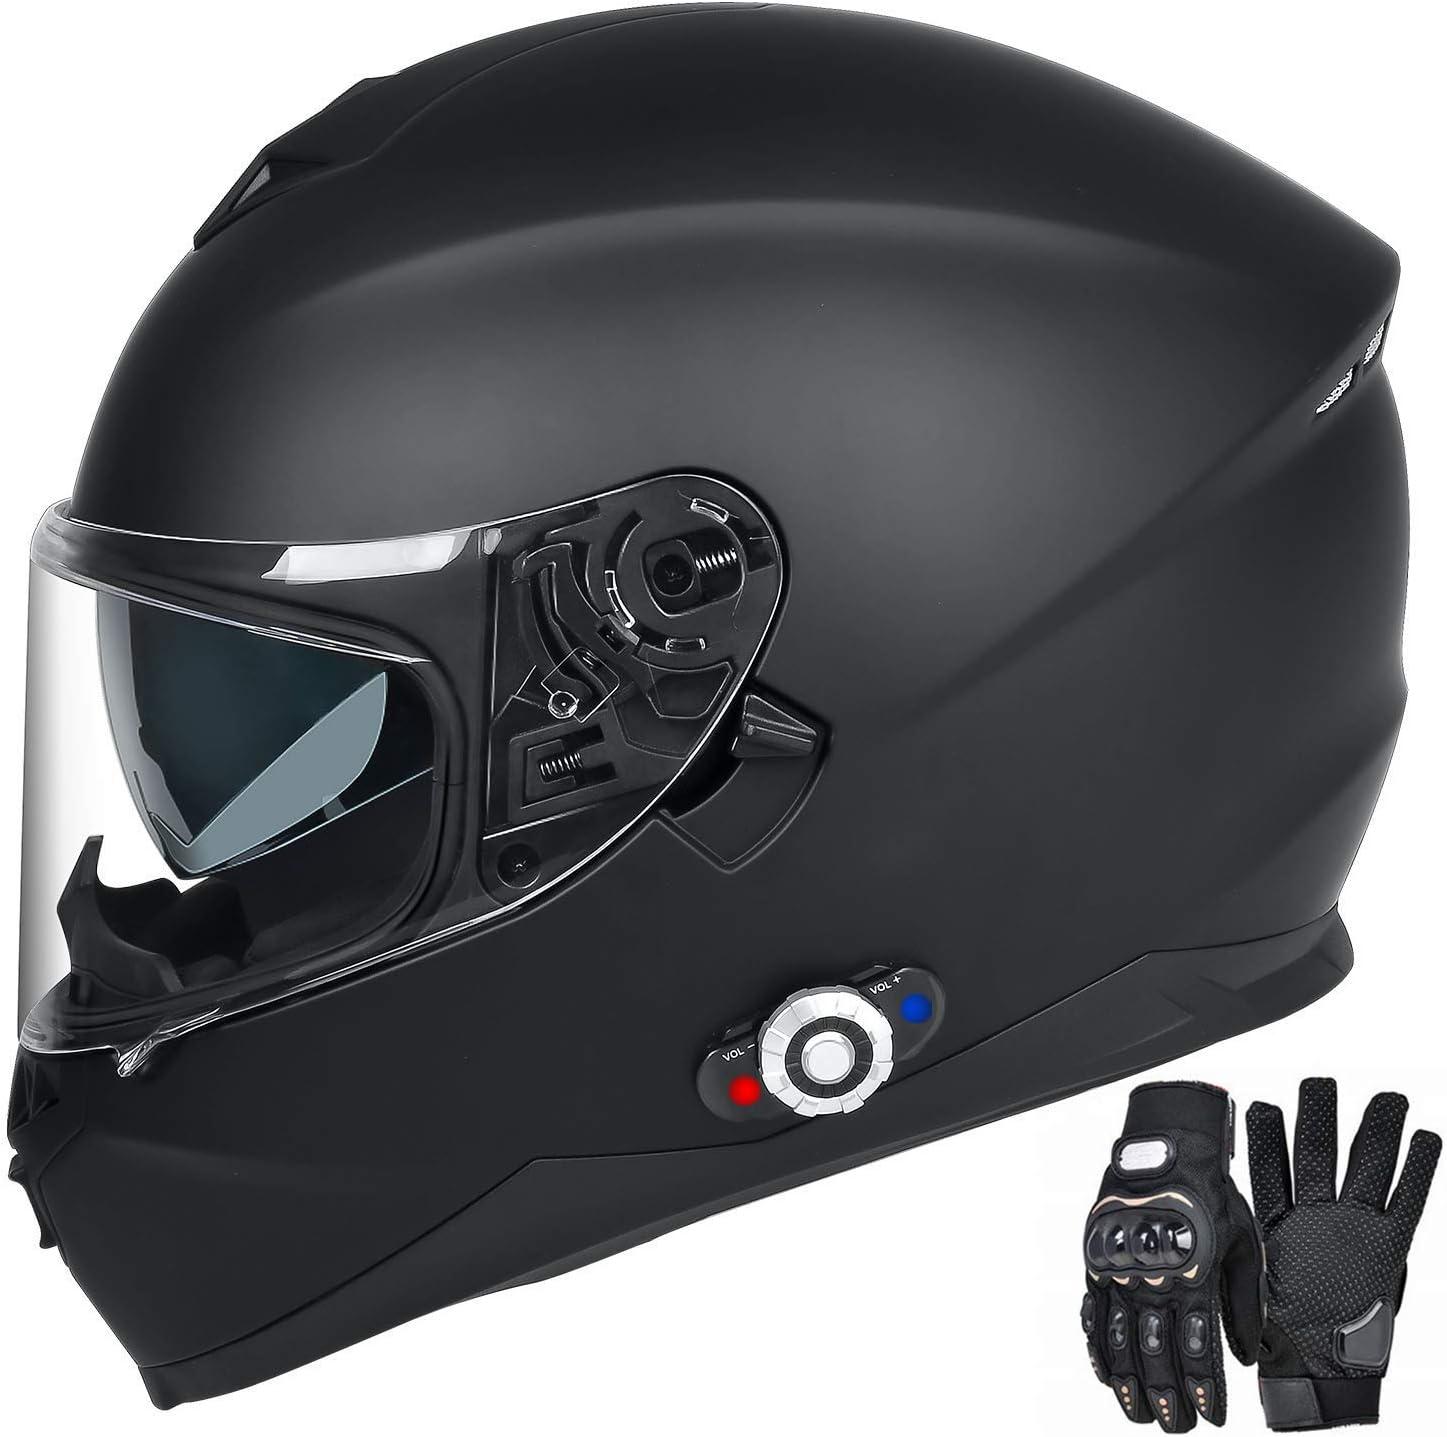 2x FDCVB Motorcycle Intercom 500M Motorbike Bluetooth Helmet Headset BT FM Radio